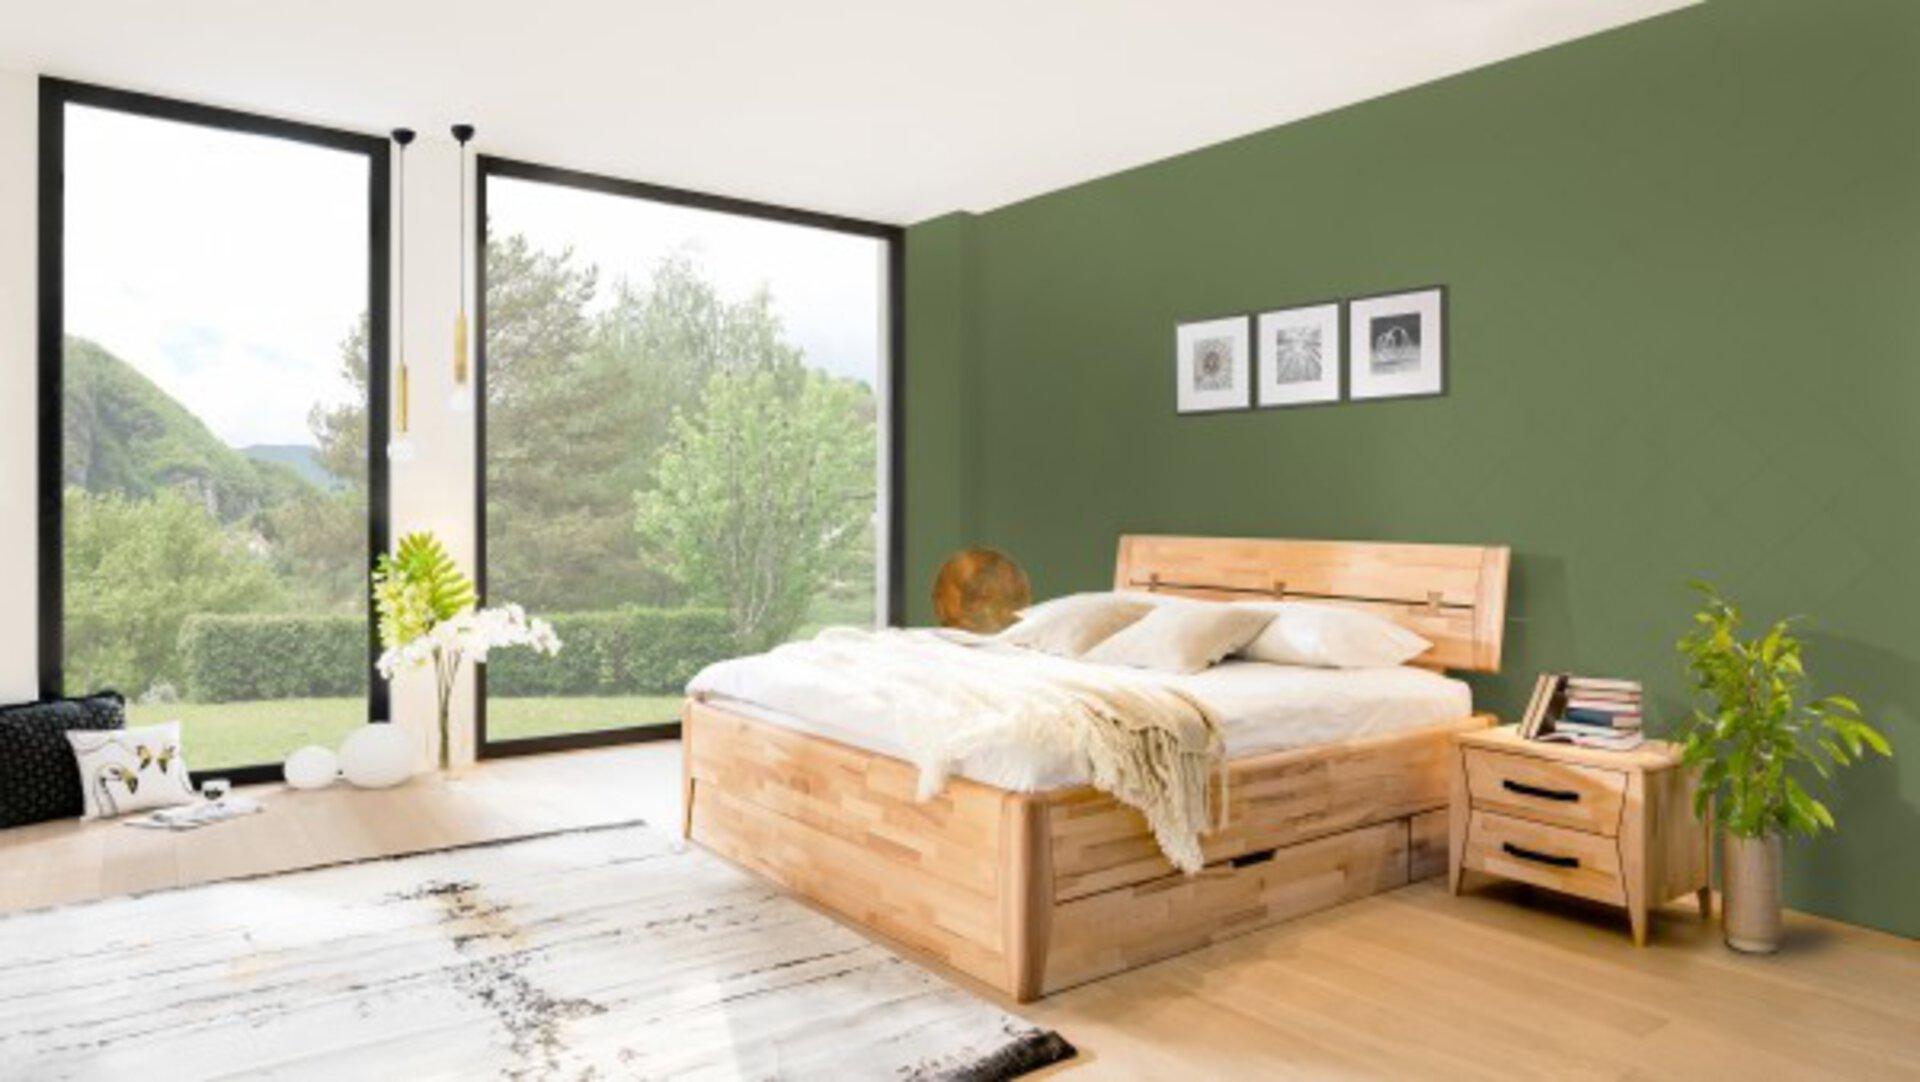 Bett OVATA VALMONDO Holz 180 x 187 x 200 cm